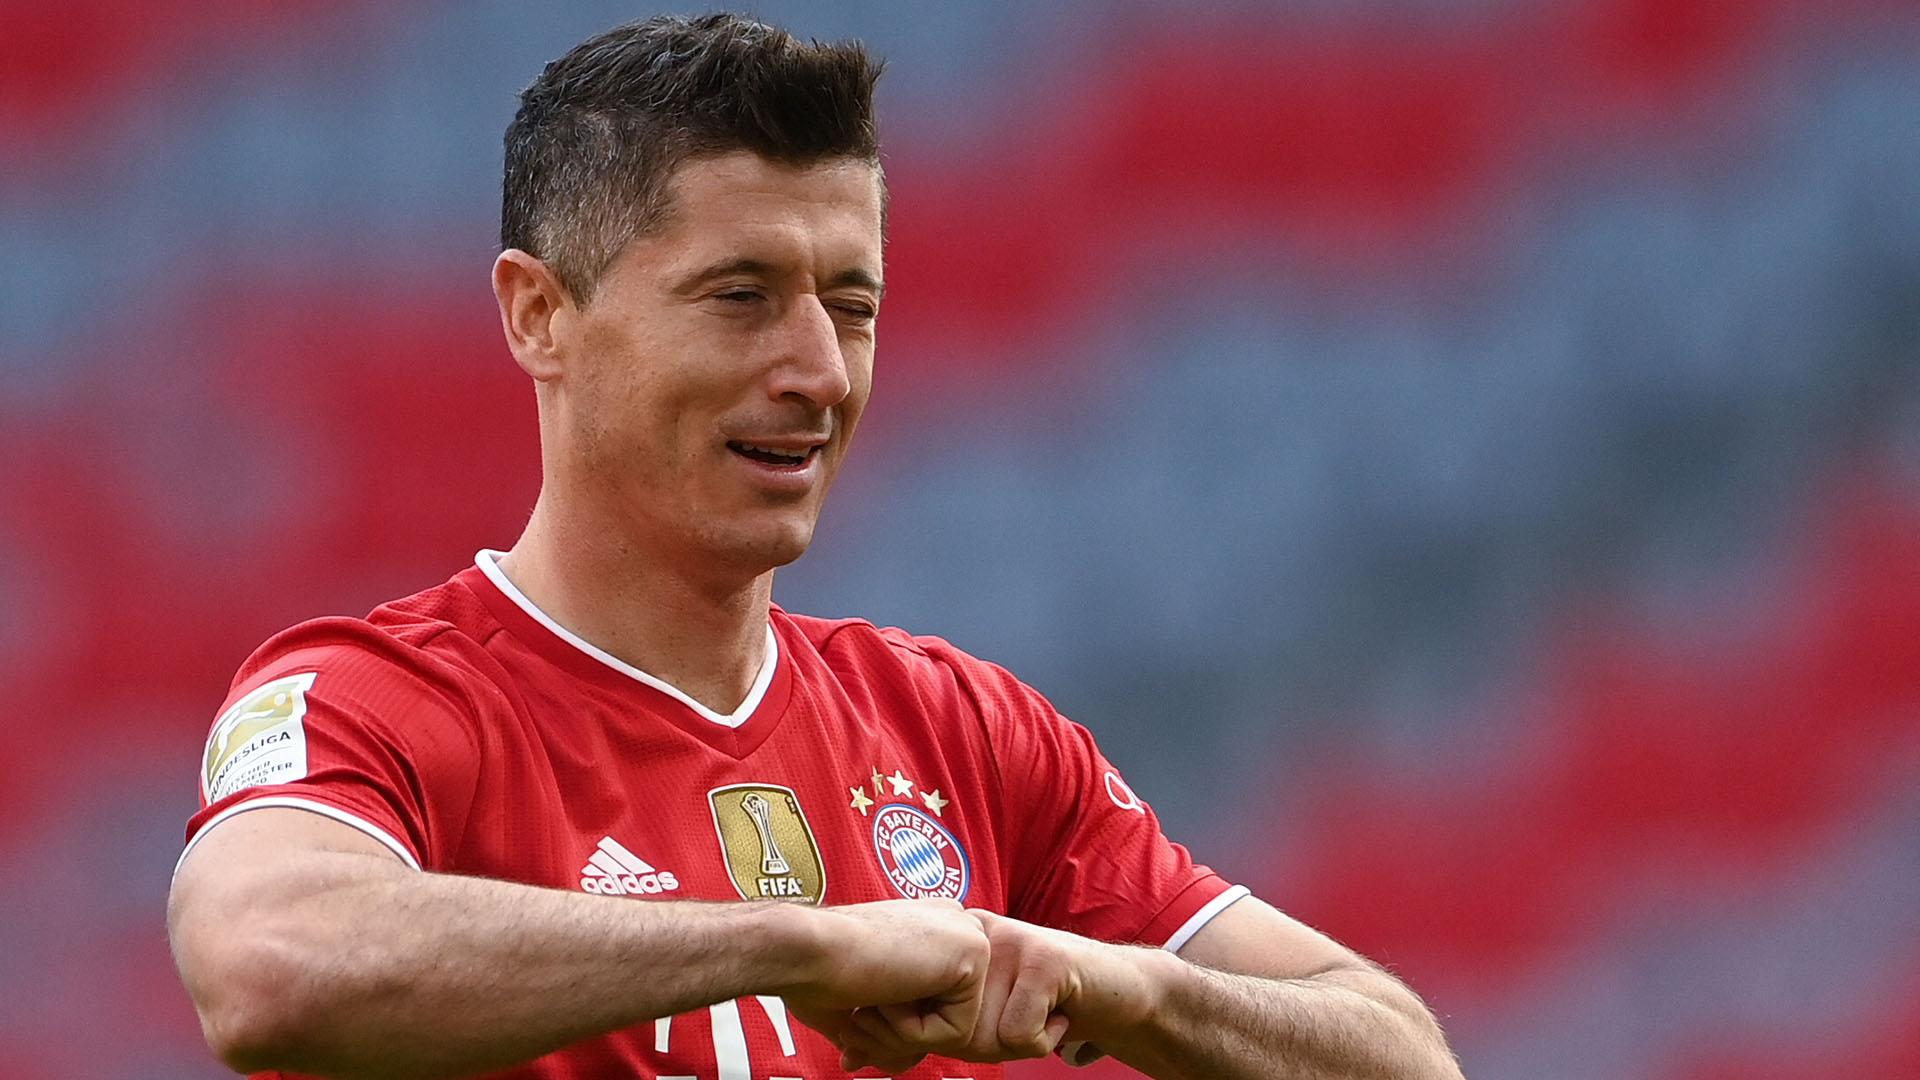 Lewandowski 'open-minded' about Bayern Munich future amid exit rumours